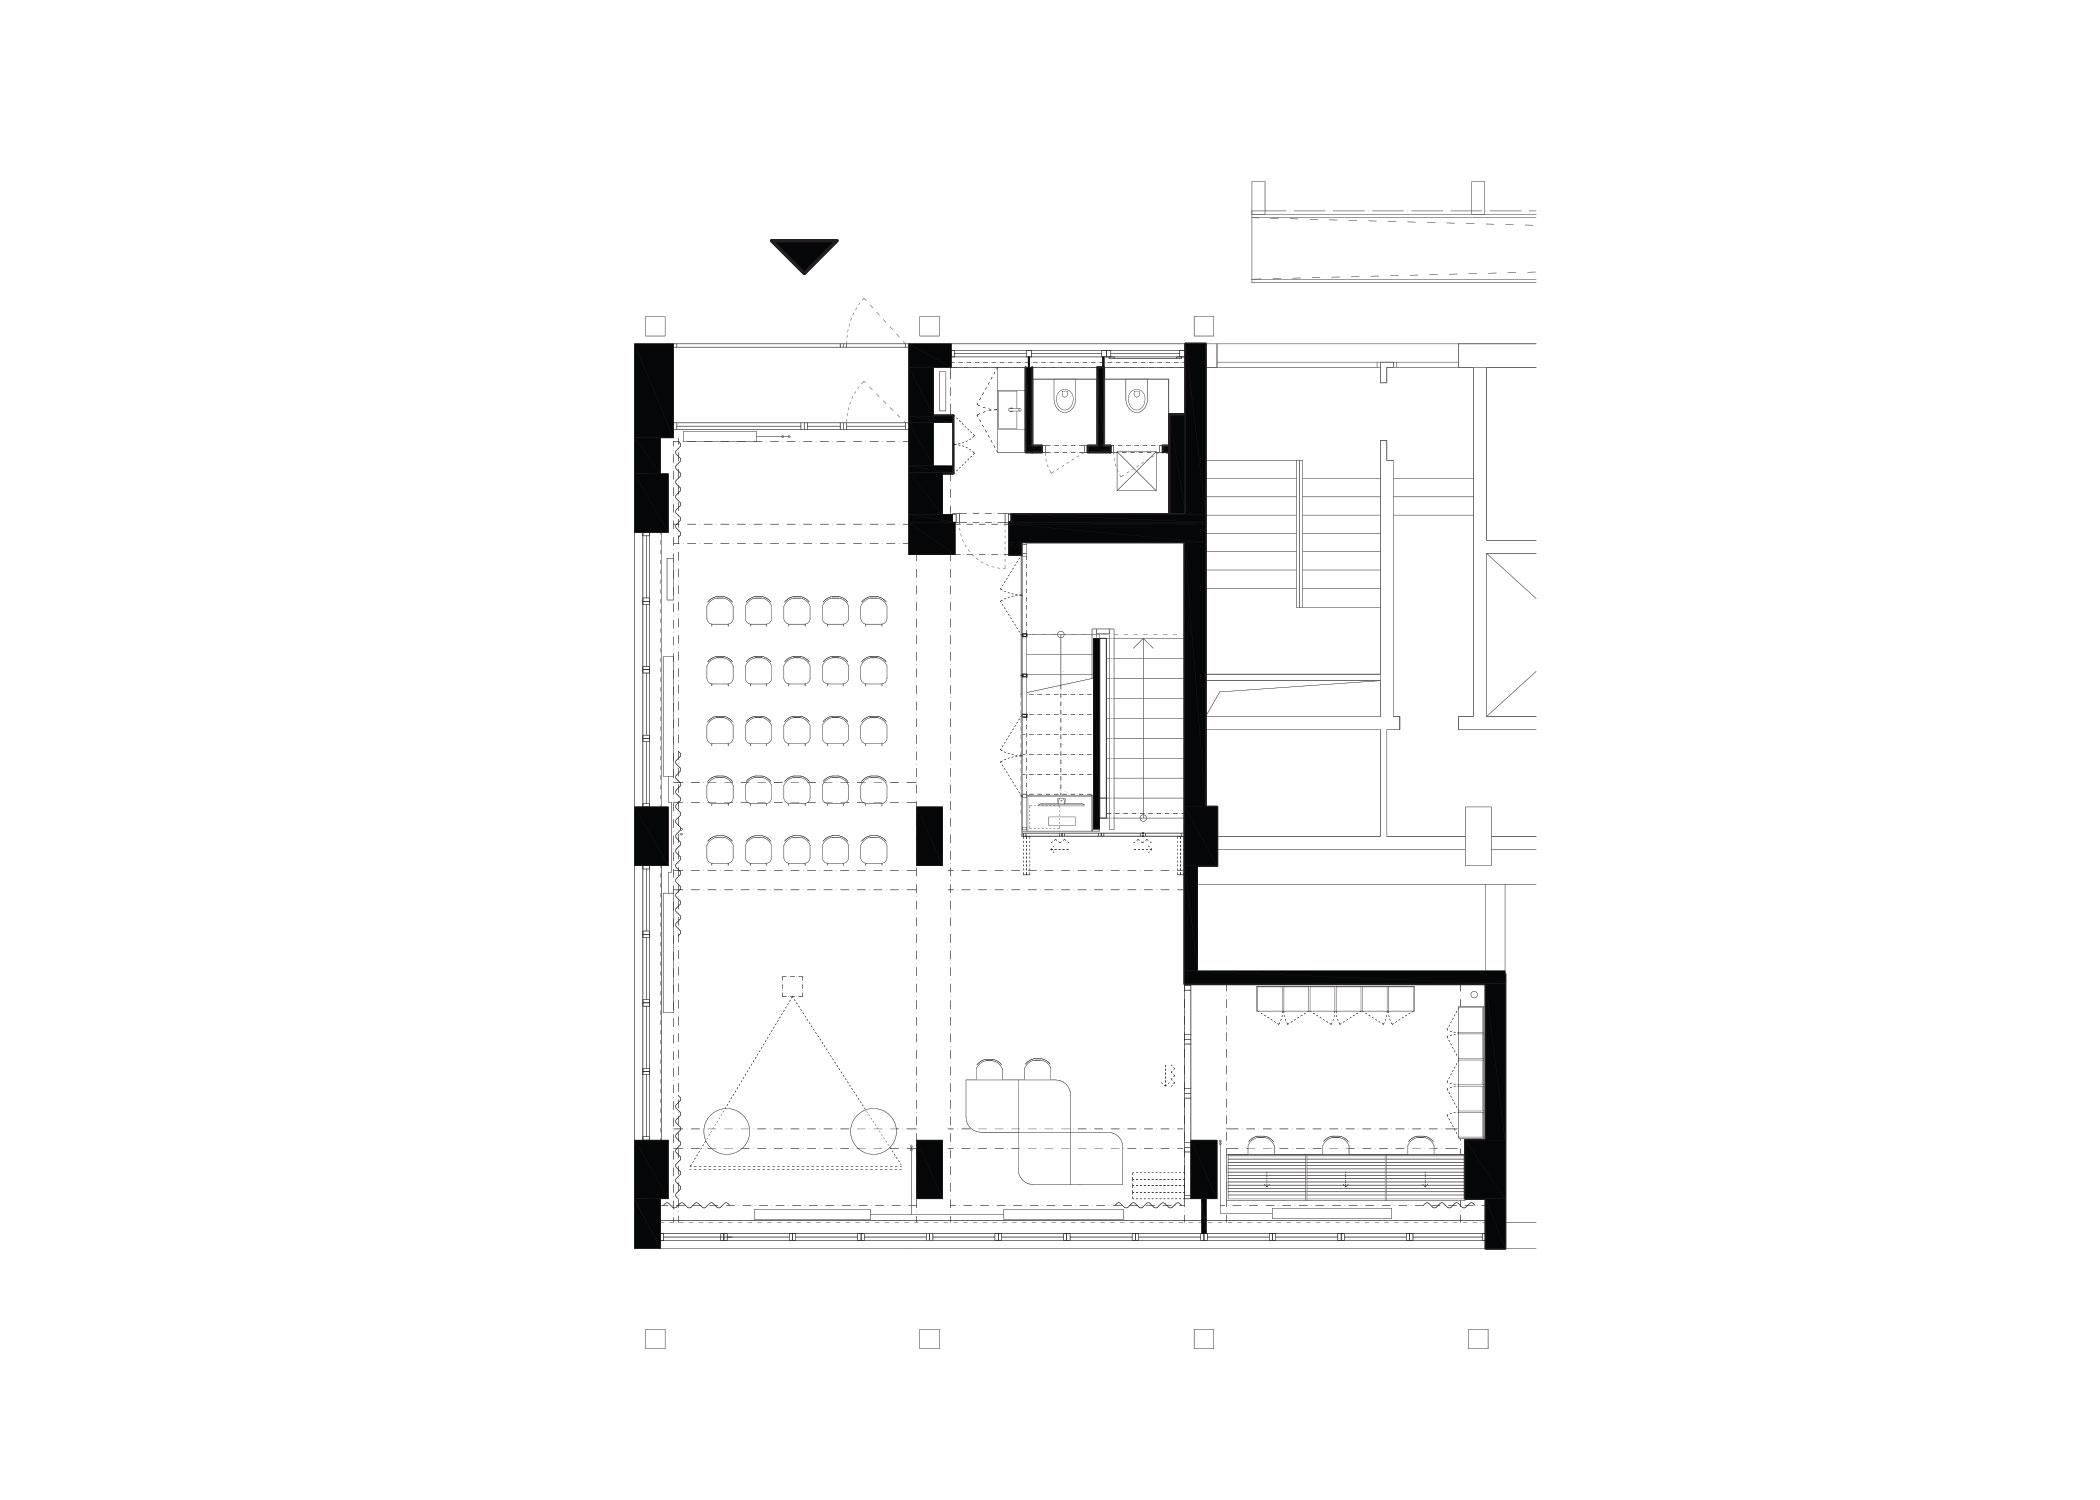 noiz-architekti-bratislava-kniznica-petrzalka-vavilovova-10